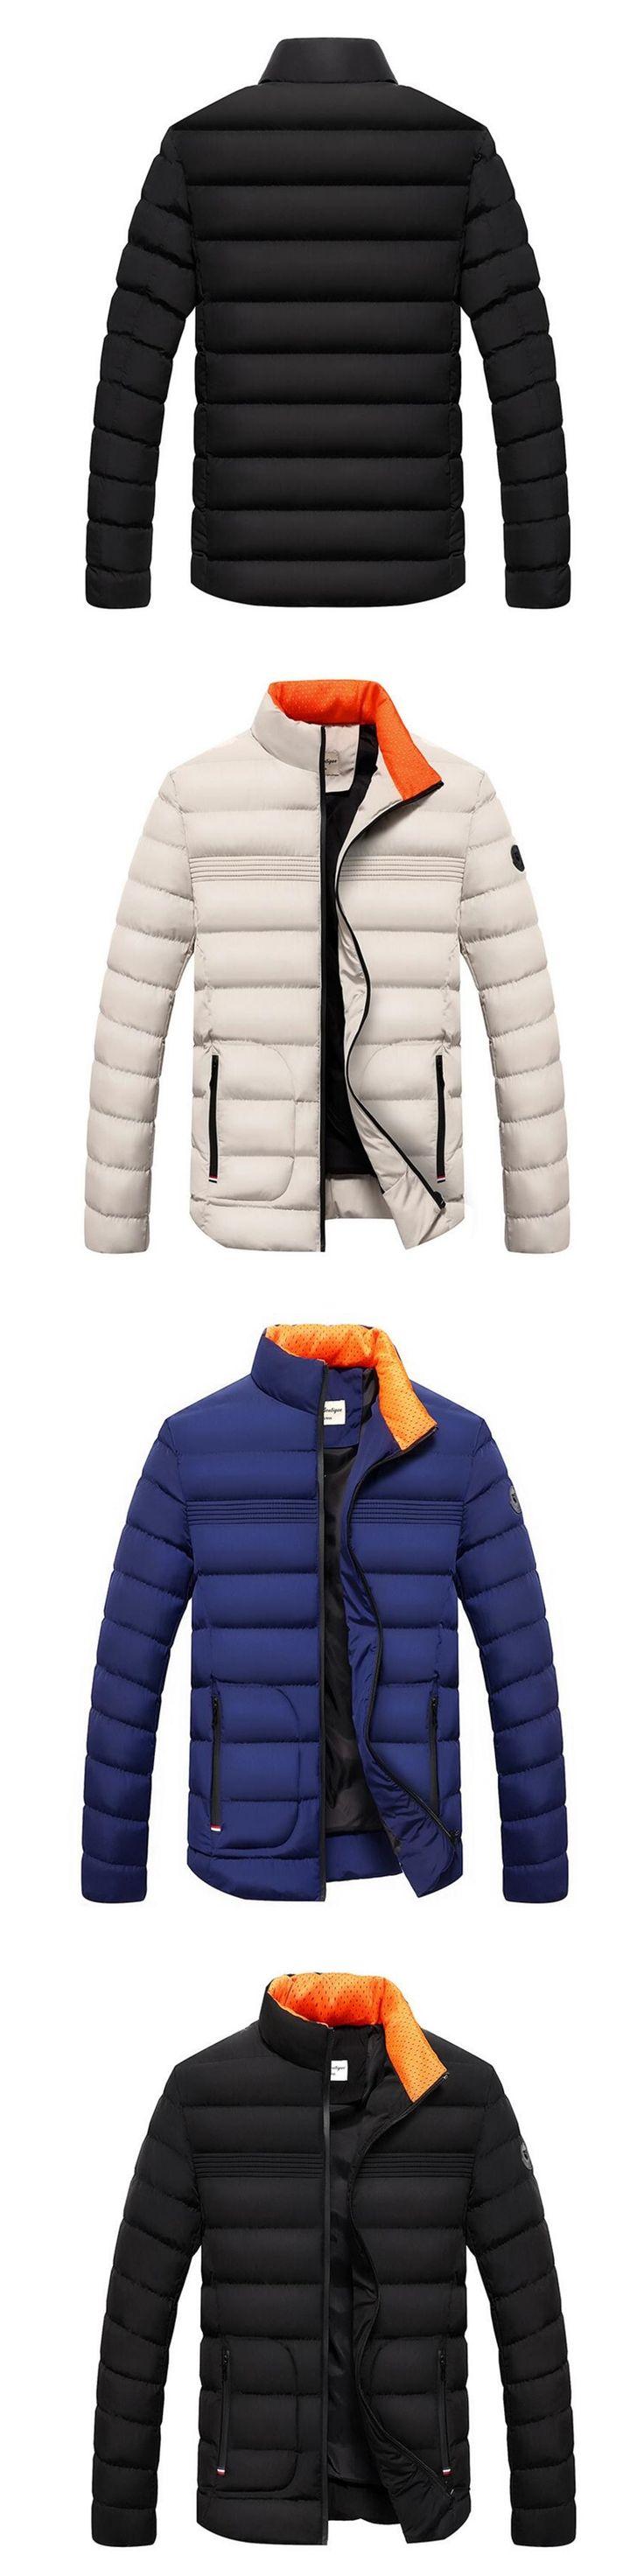 Brand Clothing Winter Jacket Men Casual Parka Jacket Thick Men Solid Black Warm Men's Coats and Jackets Fashion overcoats coat